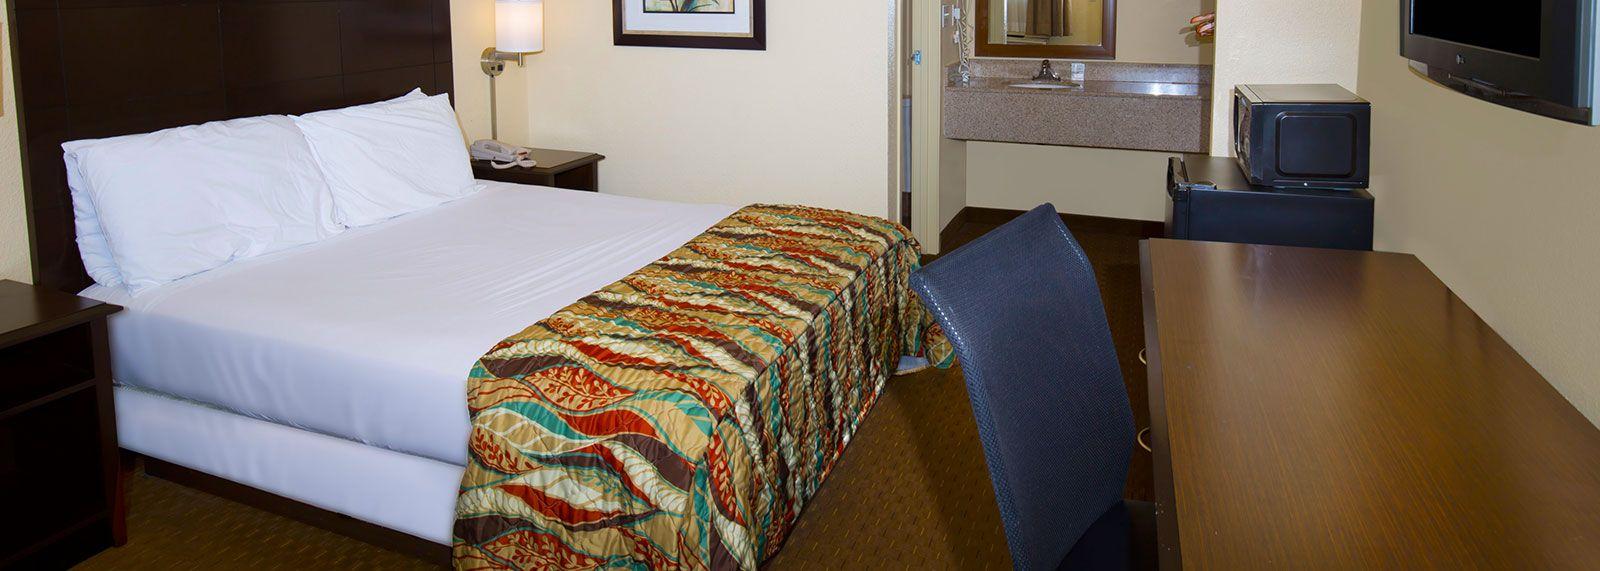 key-inn-and-suites-tustin-california-home2-top